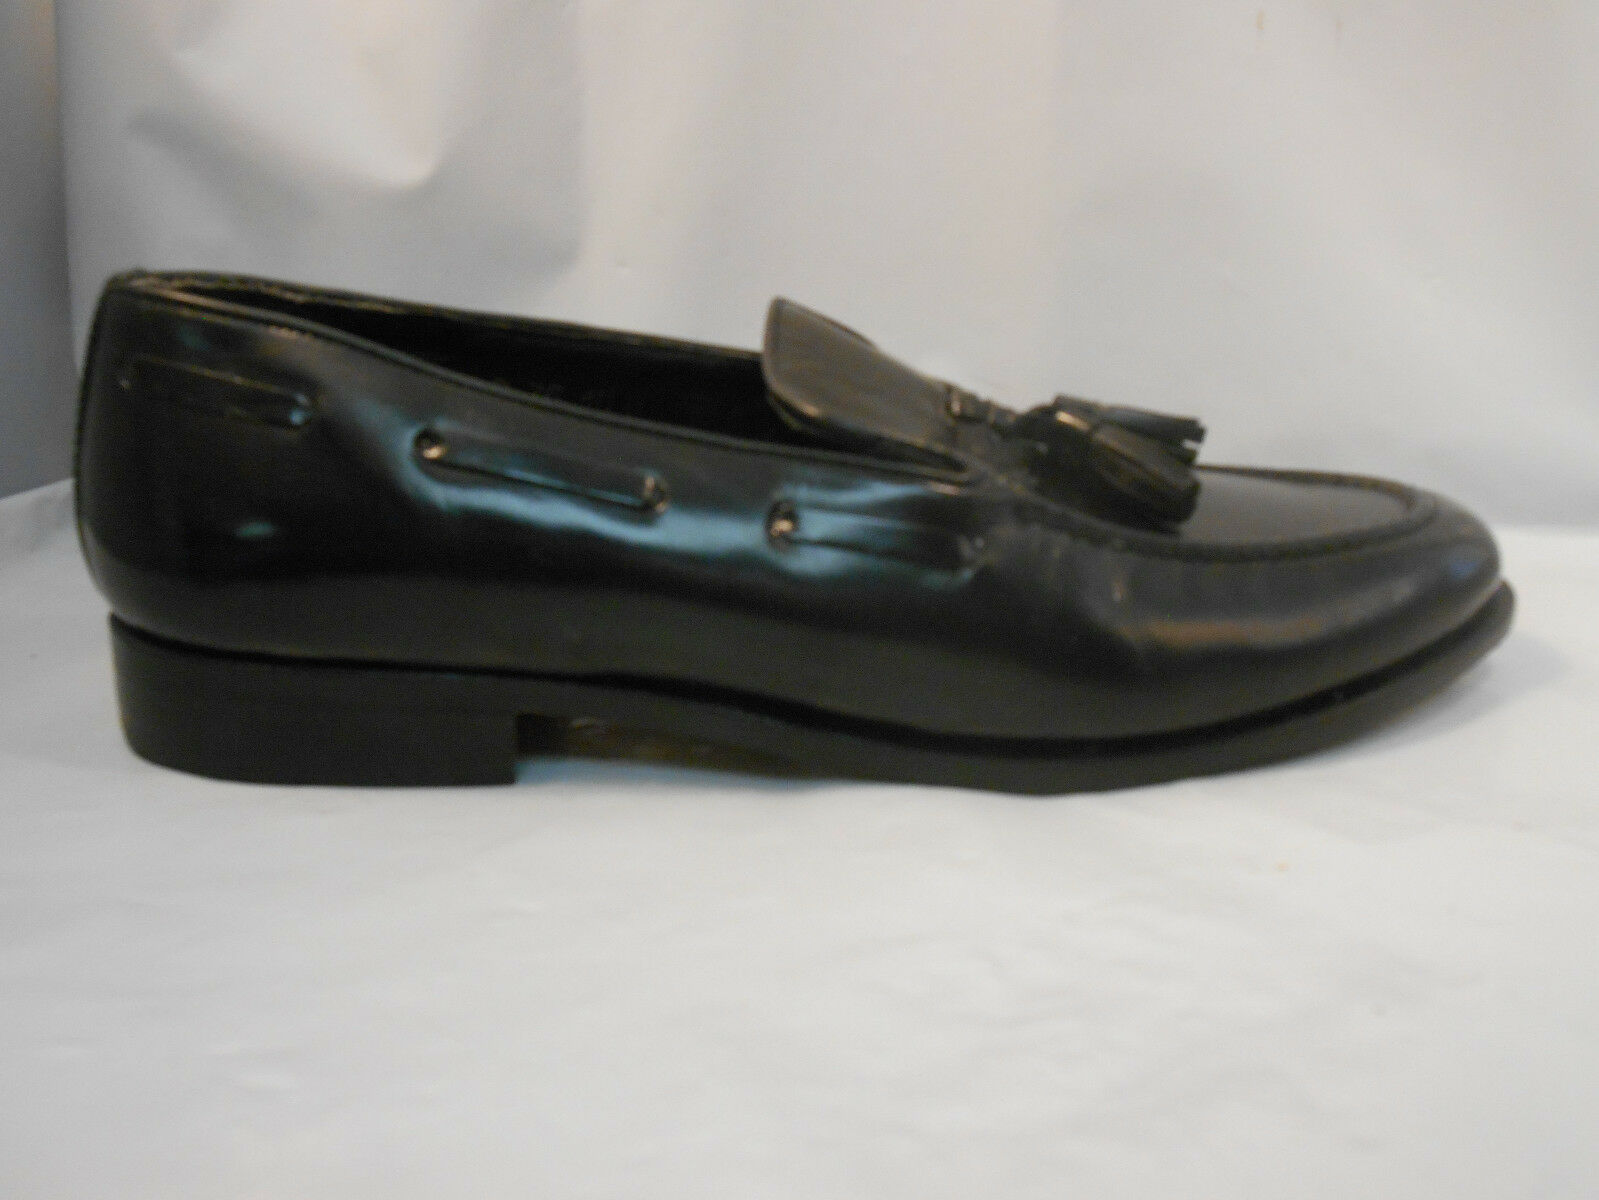 Vintage Pedwin Black Leather Tassle Loafers Slip On shoes Men's Size 10 M